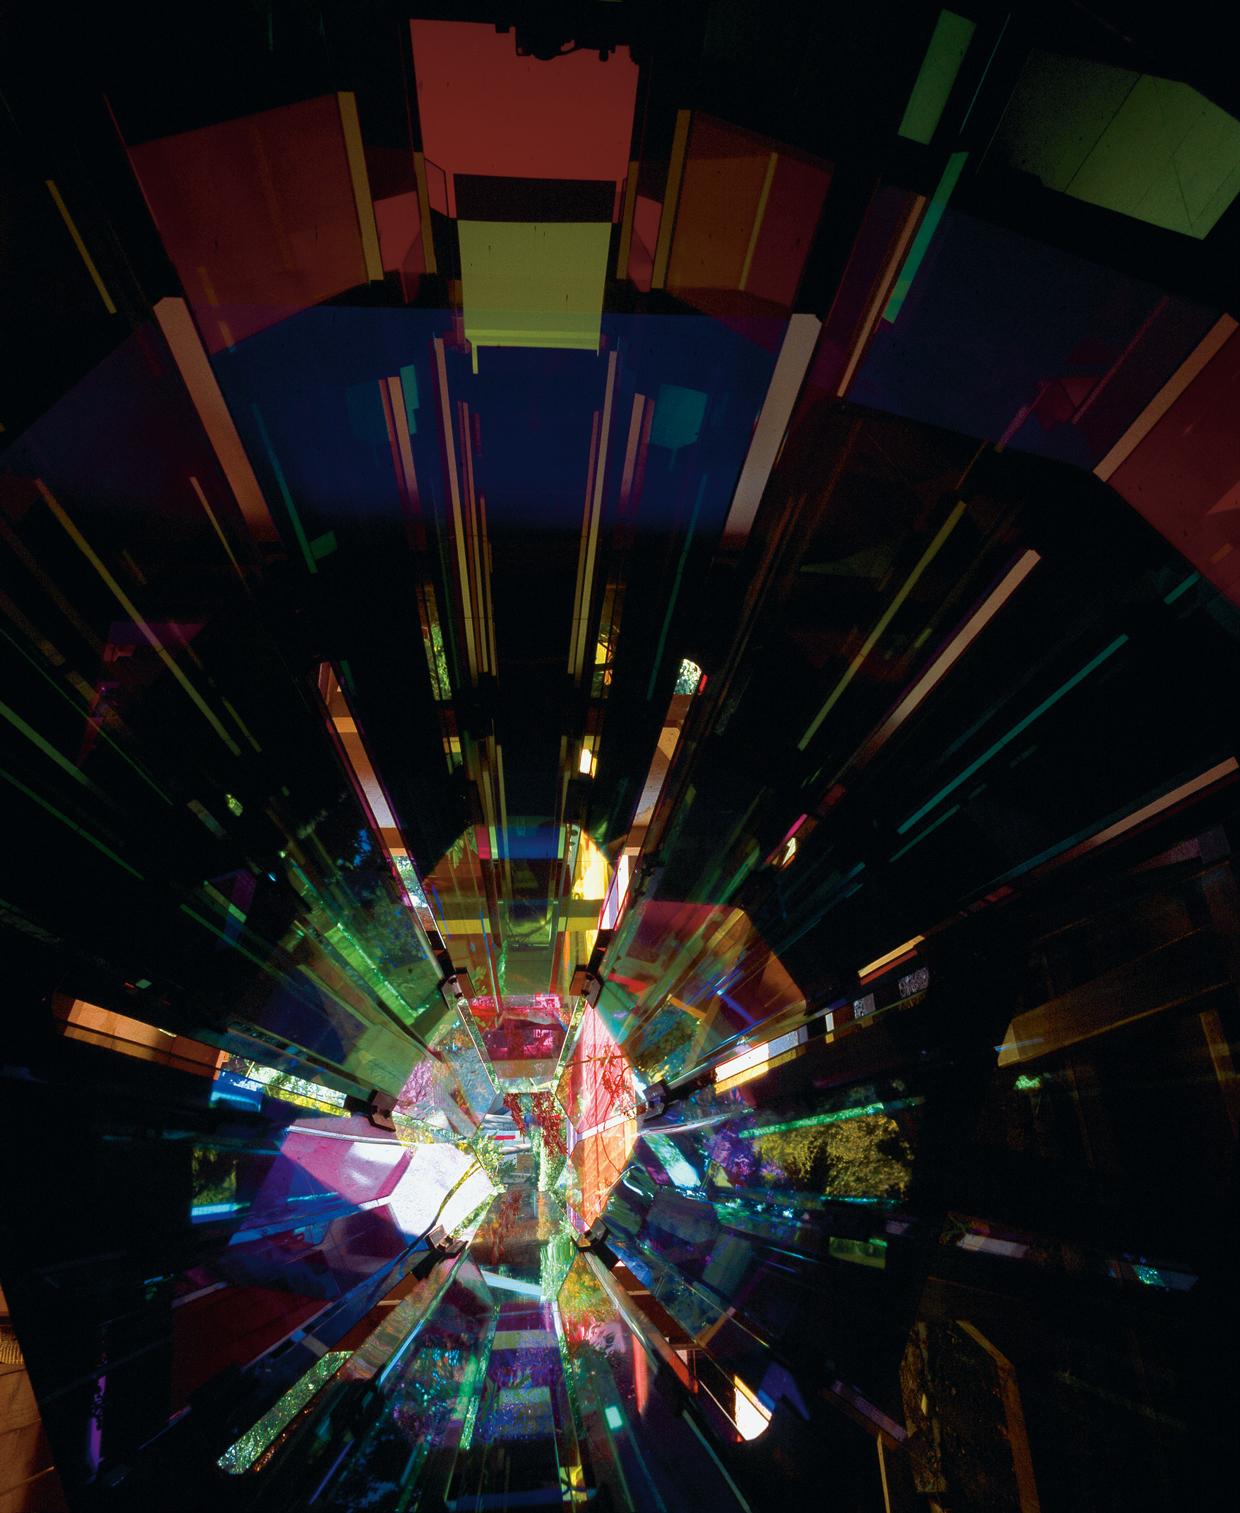 Colour spectrum, Ólafur Elíasson